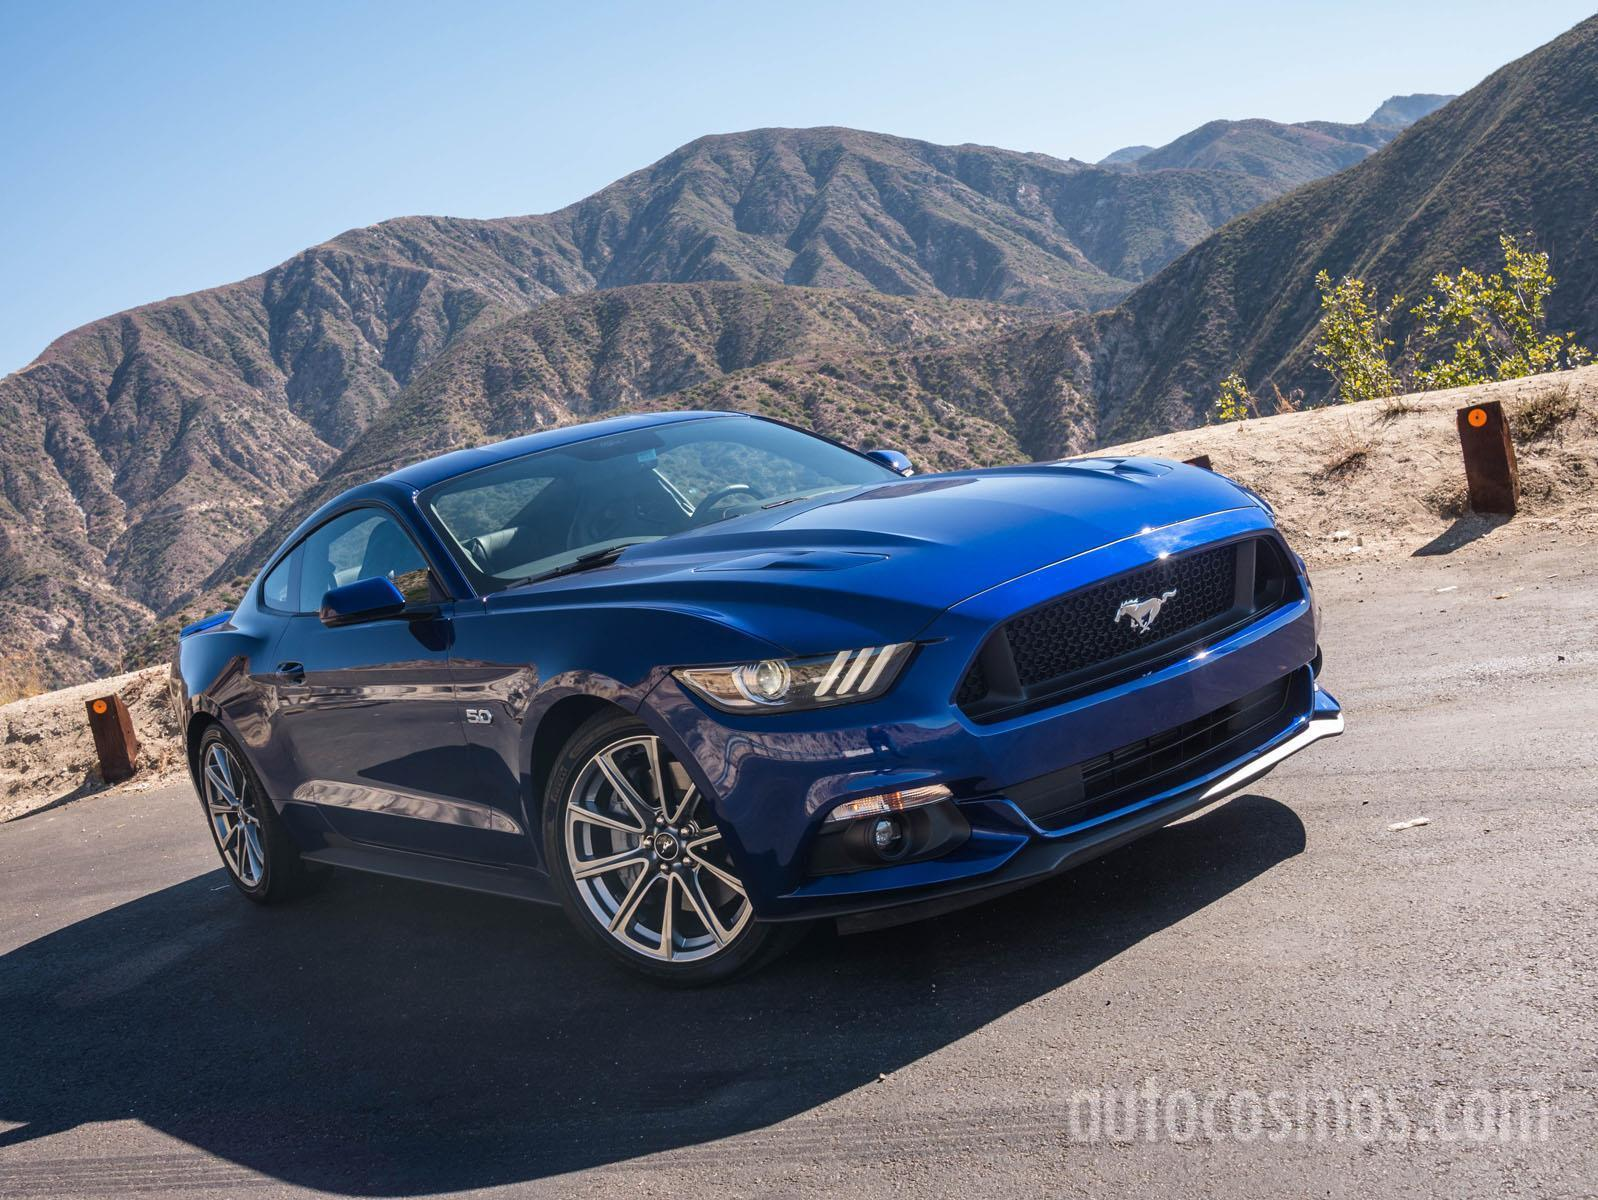 Ford Mustang 2015 Llega A M 233 Xico Desde 450 000 Pesos